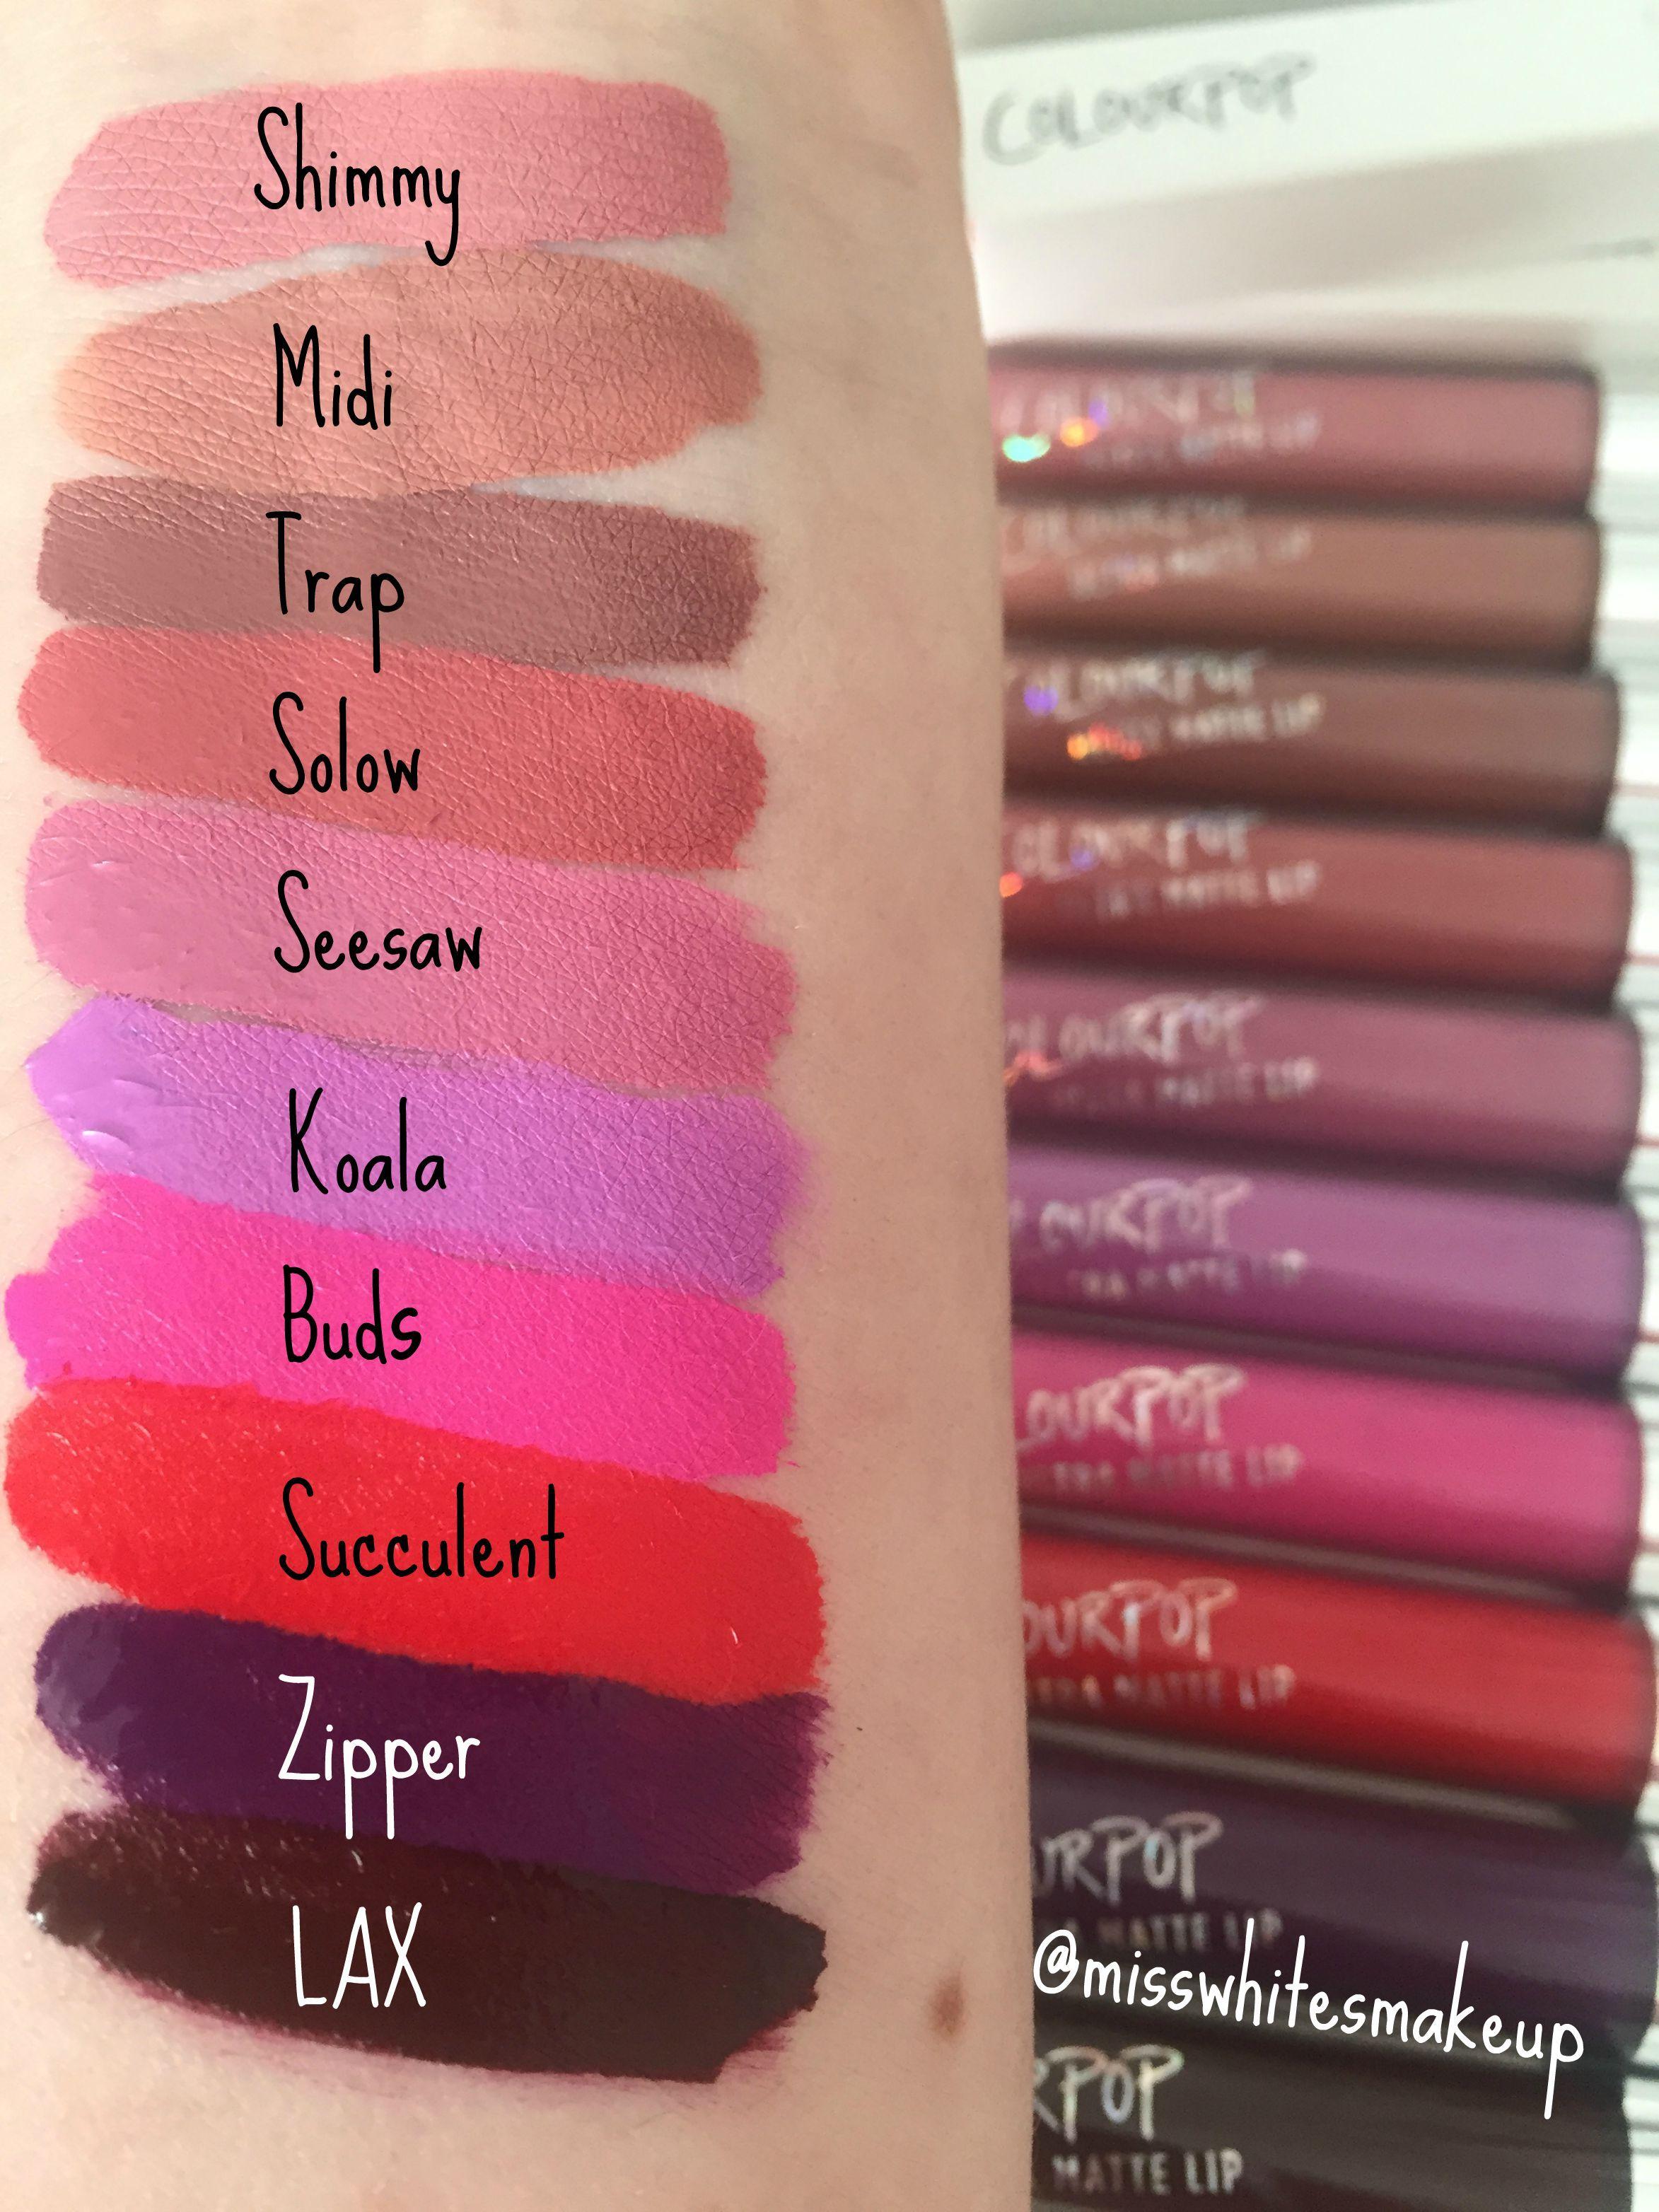 Lip Gloss by Morphe #20